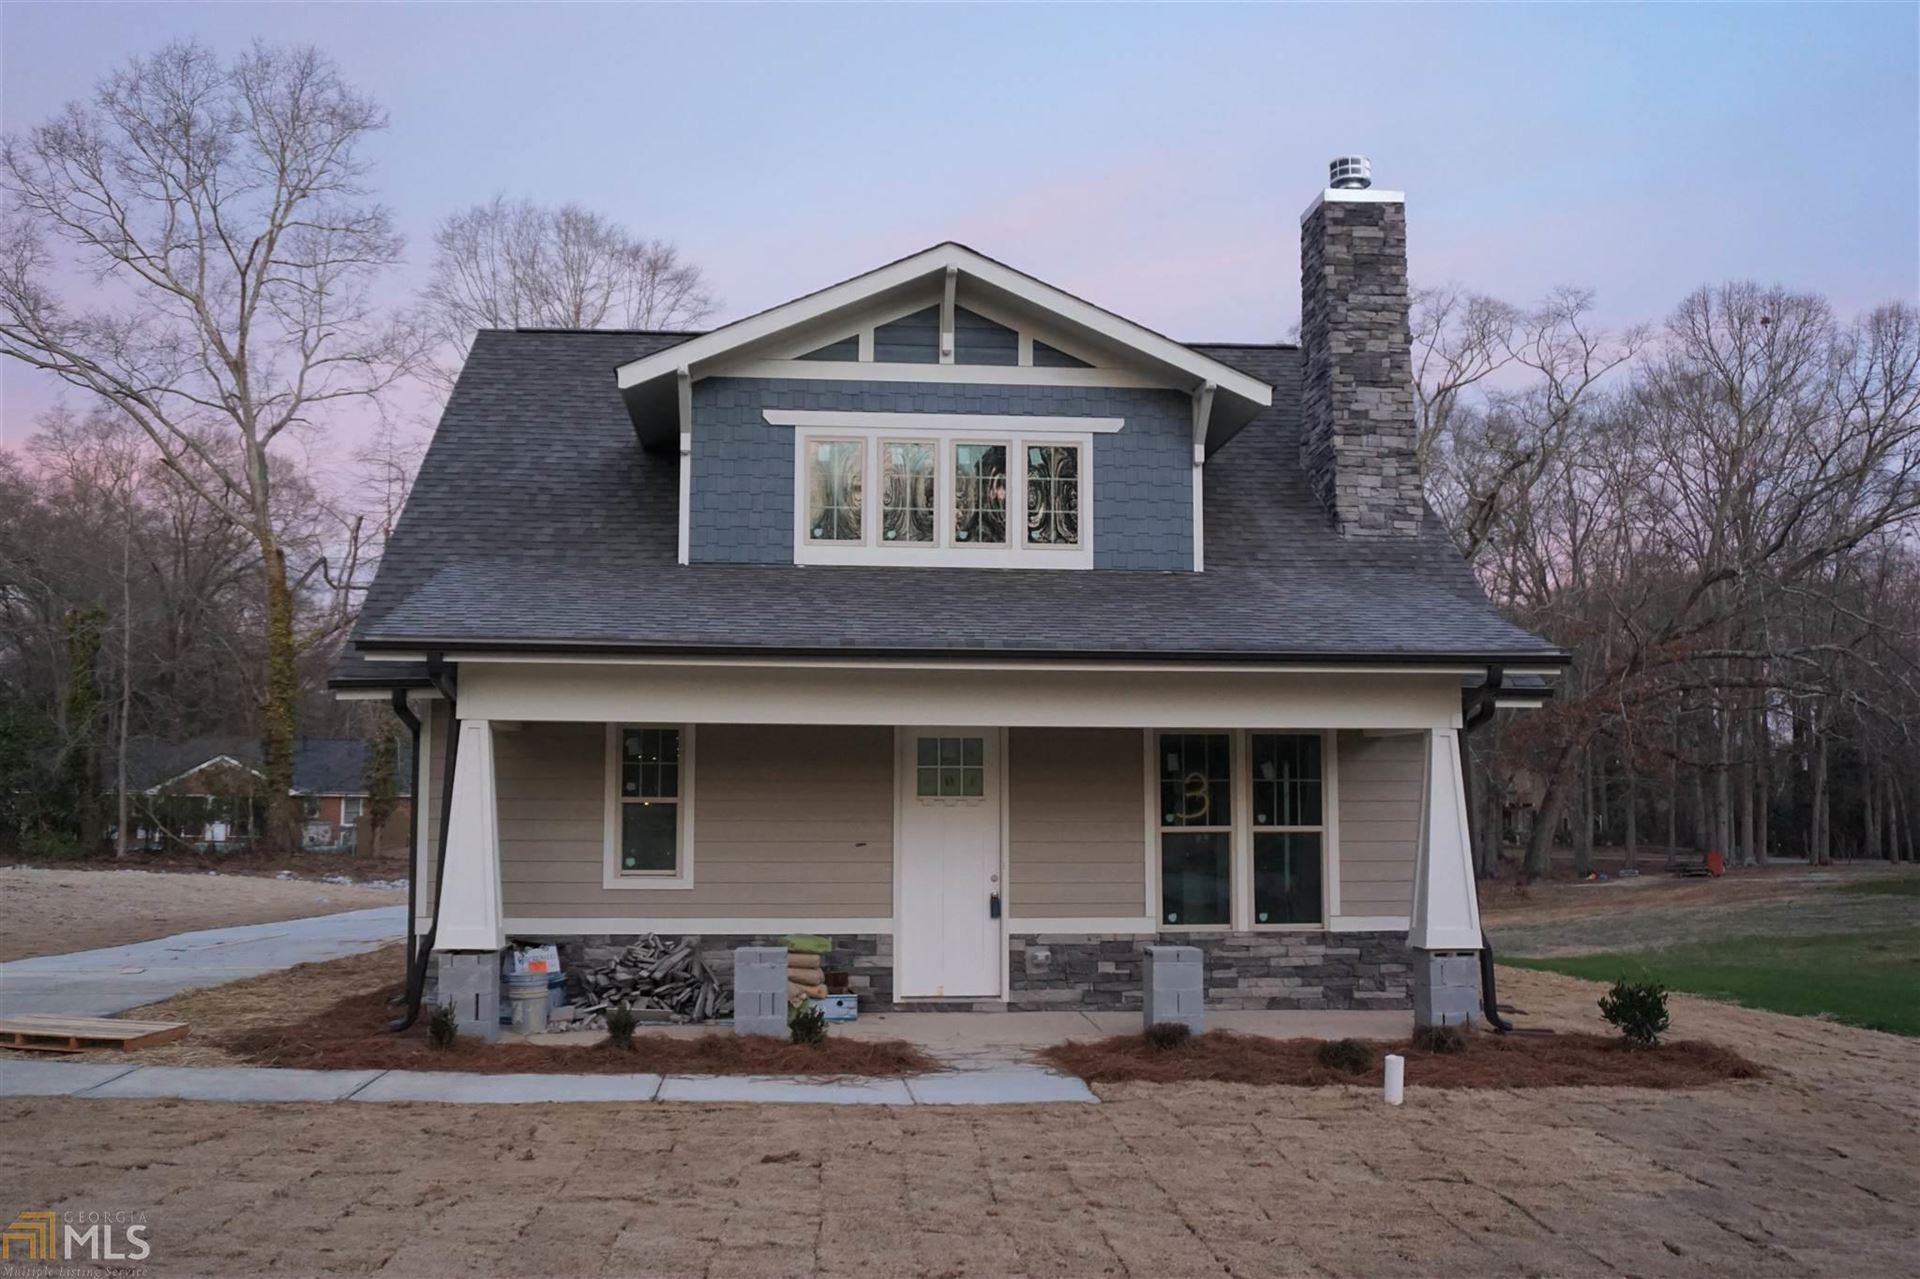 198 Woodlawn Ave, Winder, GA 30680 - MLS#: 8885872